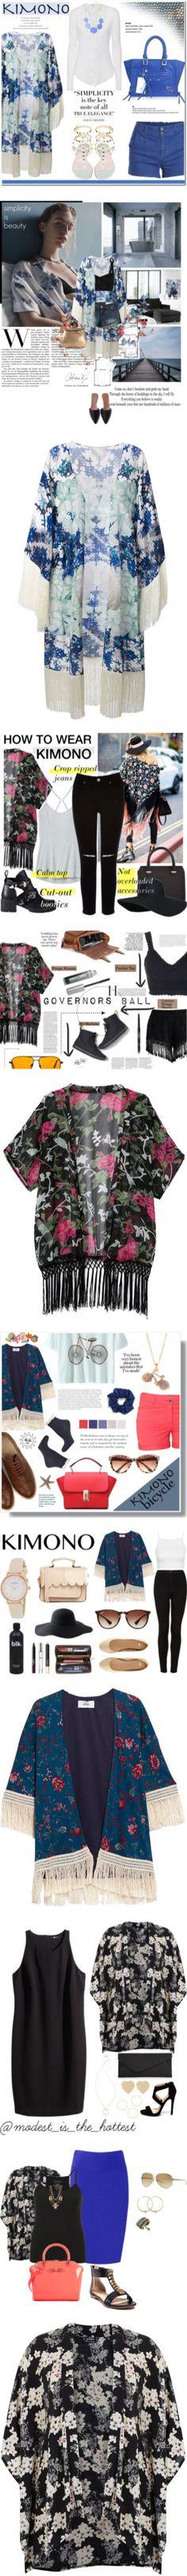 15 Ways to Wear a Floral Kimono by polyvore-editorial on Polyvore featuring polyvore, waystowear, floralkimono, fashion, style, Athena Procopiou, Pieces, James Perse, kimono, contestentry, avber, Dolce&Gabbana, rag & bone/JEAN, Jimmy Choo, Zara, clothing, intimates, robes, blue, blue kimono, blue silk robe, silk robe, blue robe, kimono robe, Athleta, Oasis, Refresh, Victoria Beckham, Topshop, Chicwish, American Eagle Outfitters, Bare Escentuals, Chanel, kimonos, outerwear, tops, cardigans…